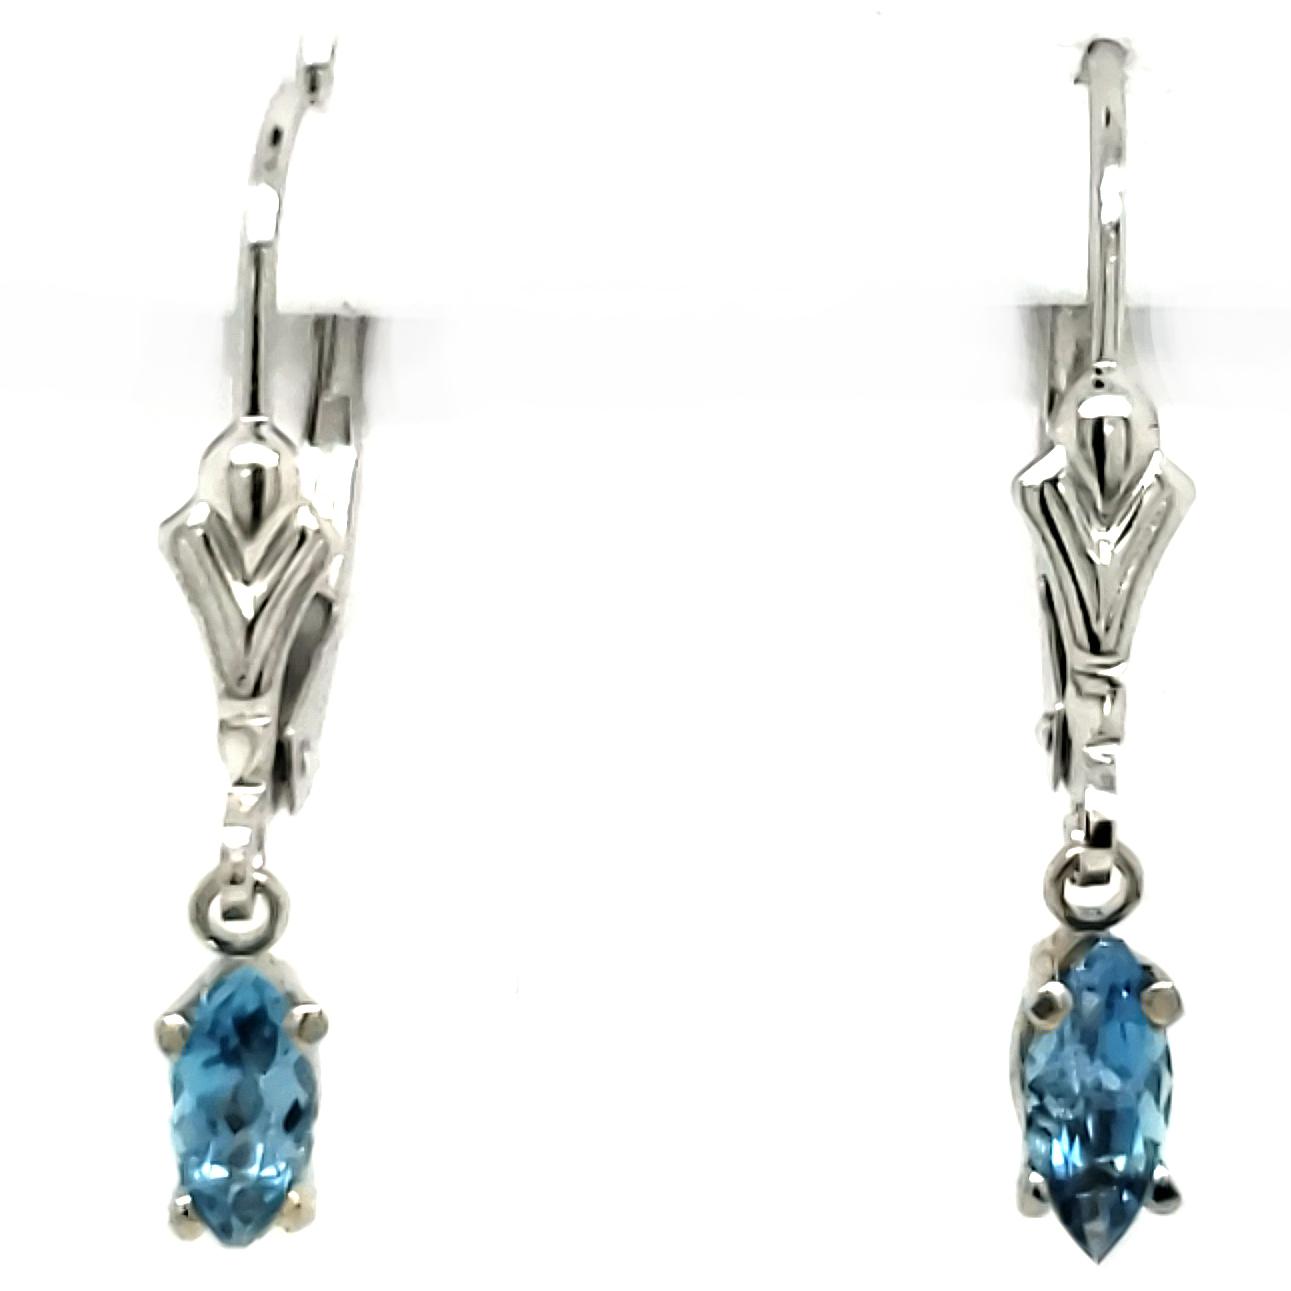 .43 ct. Aquamarine Earrings